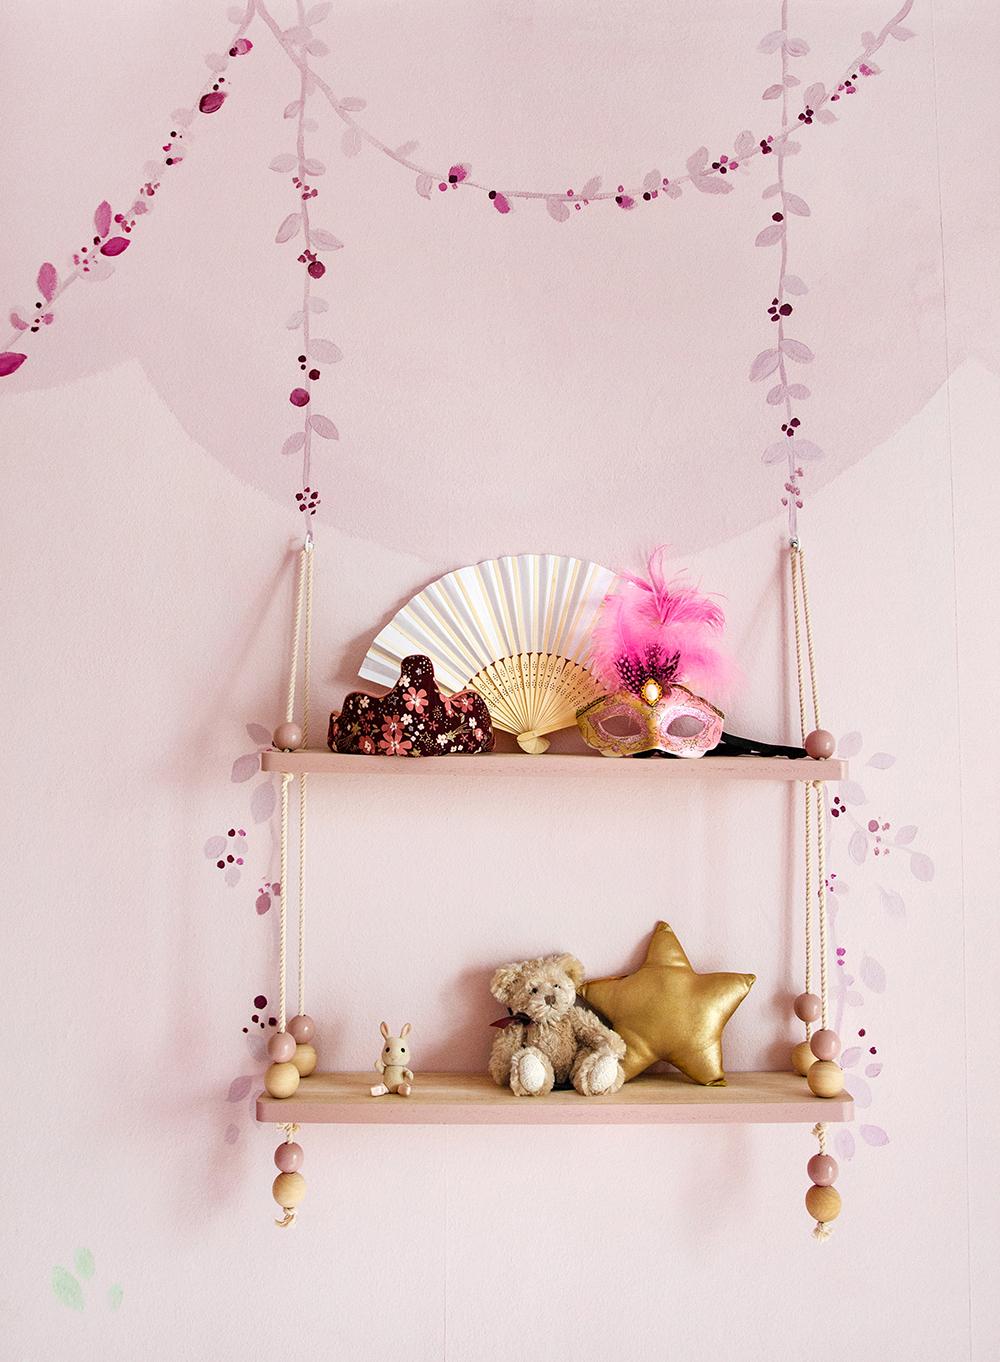 Wandgestaltung floral